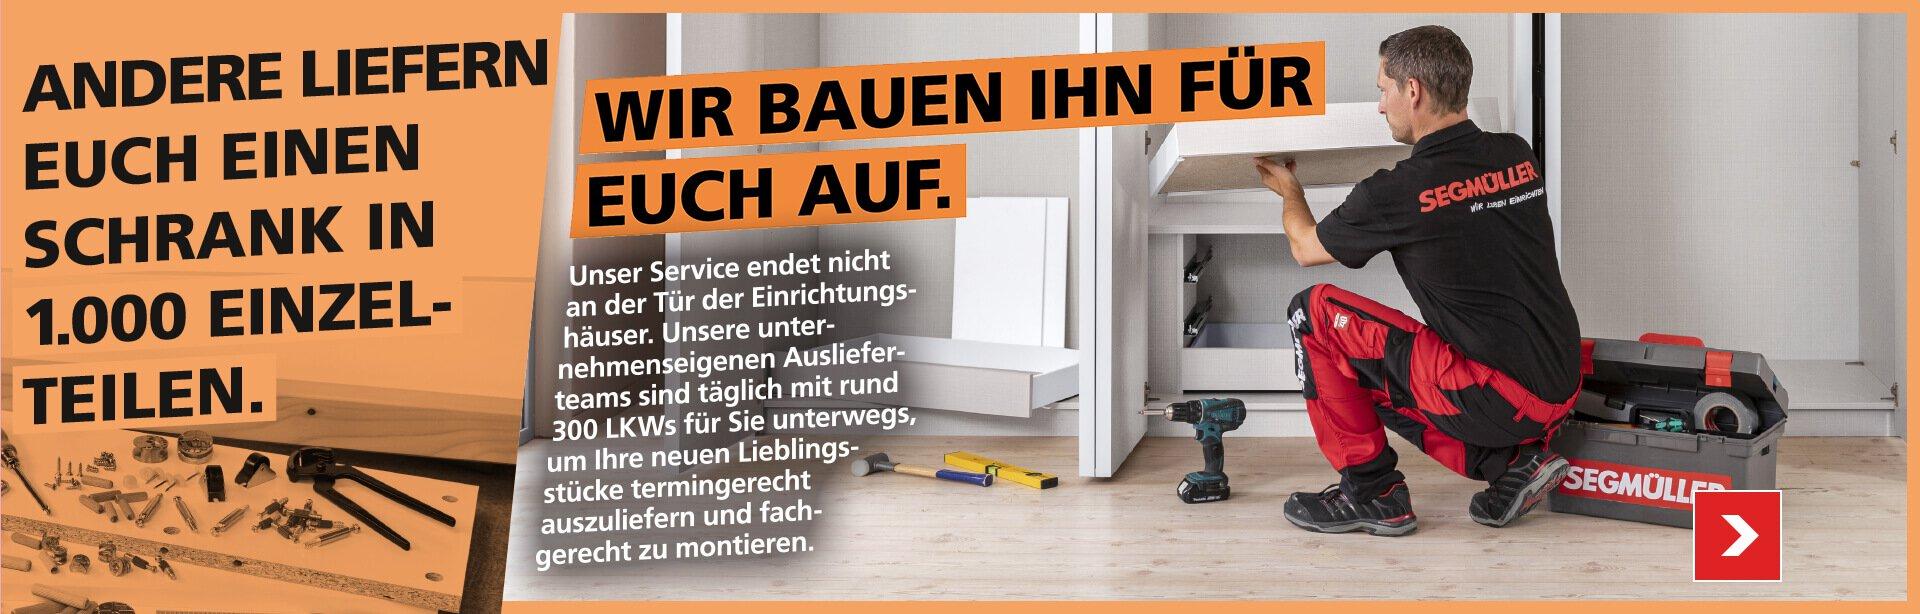 Aufbauservice SEGMÜLLER